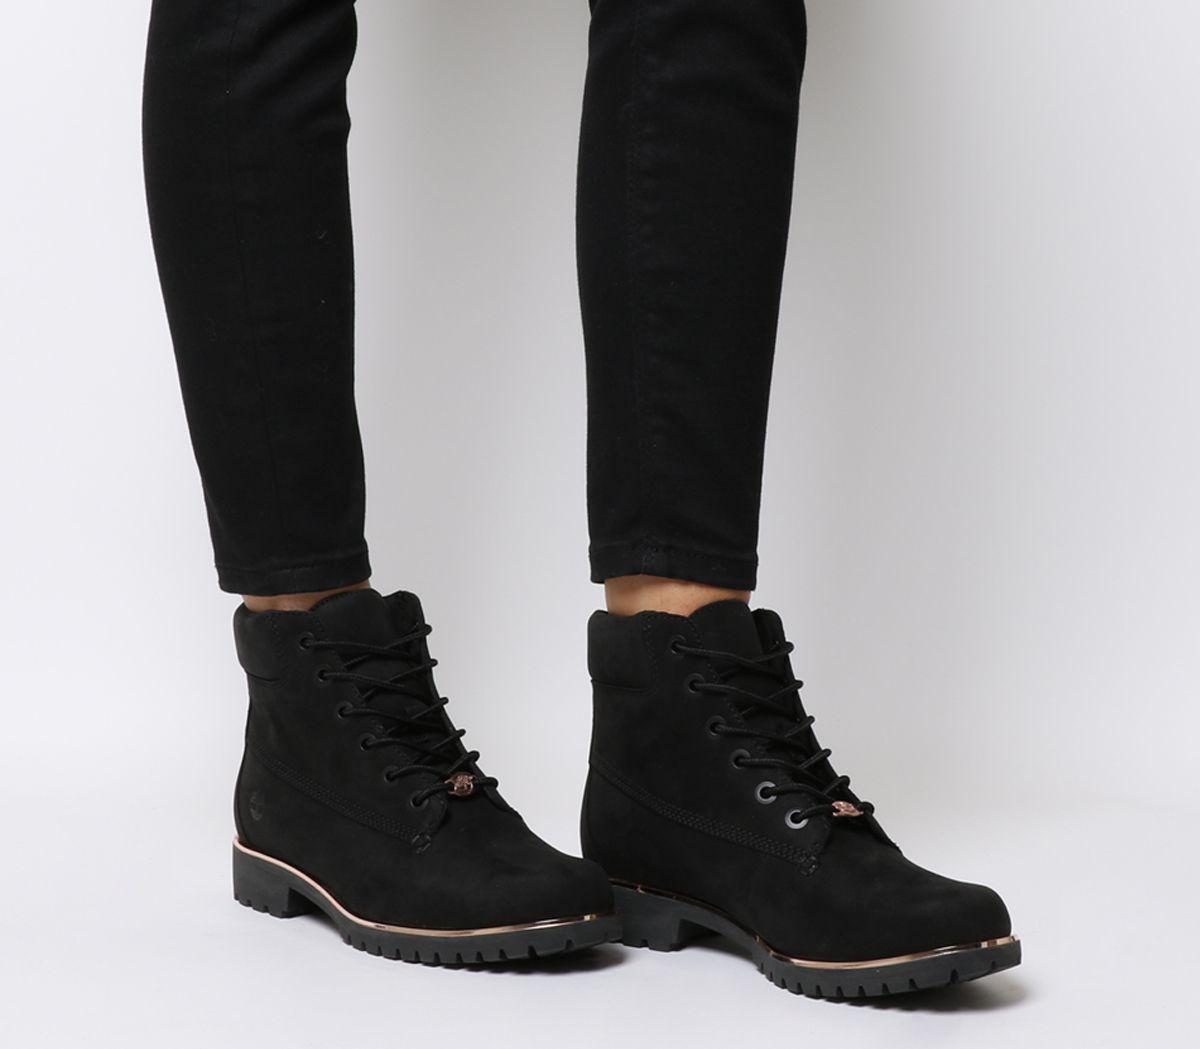 2860807c7fa4ca Dettagli su Donna Timberland Slim Premium 15.2cm Stivali Neri Rosa Dorato  Rand Stivali